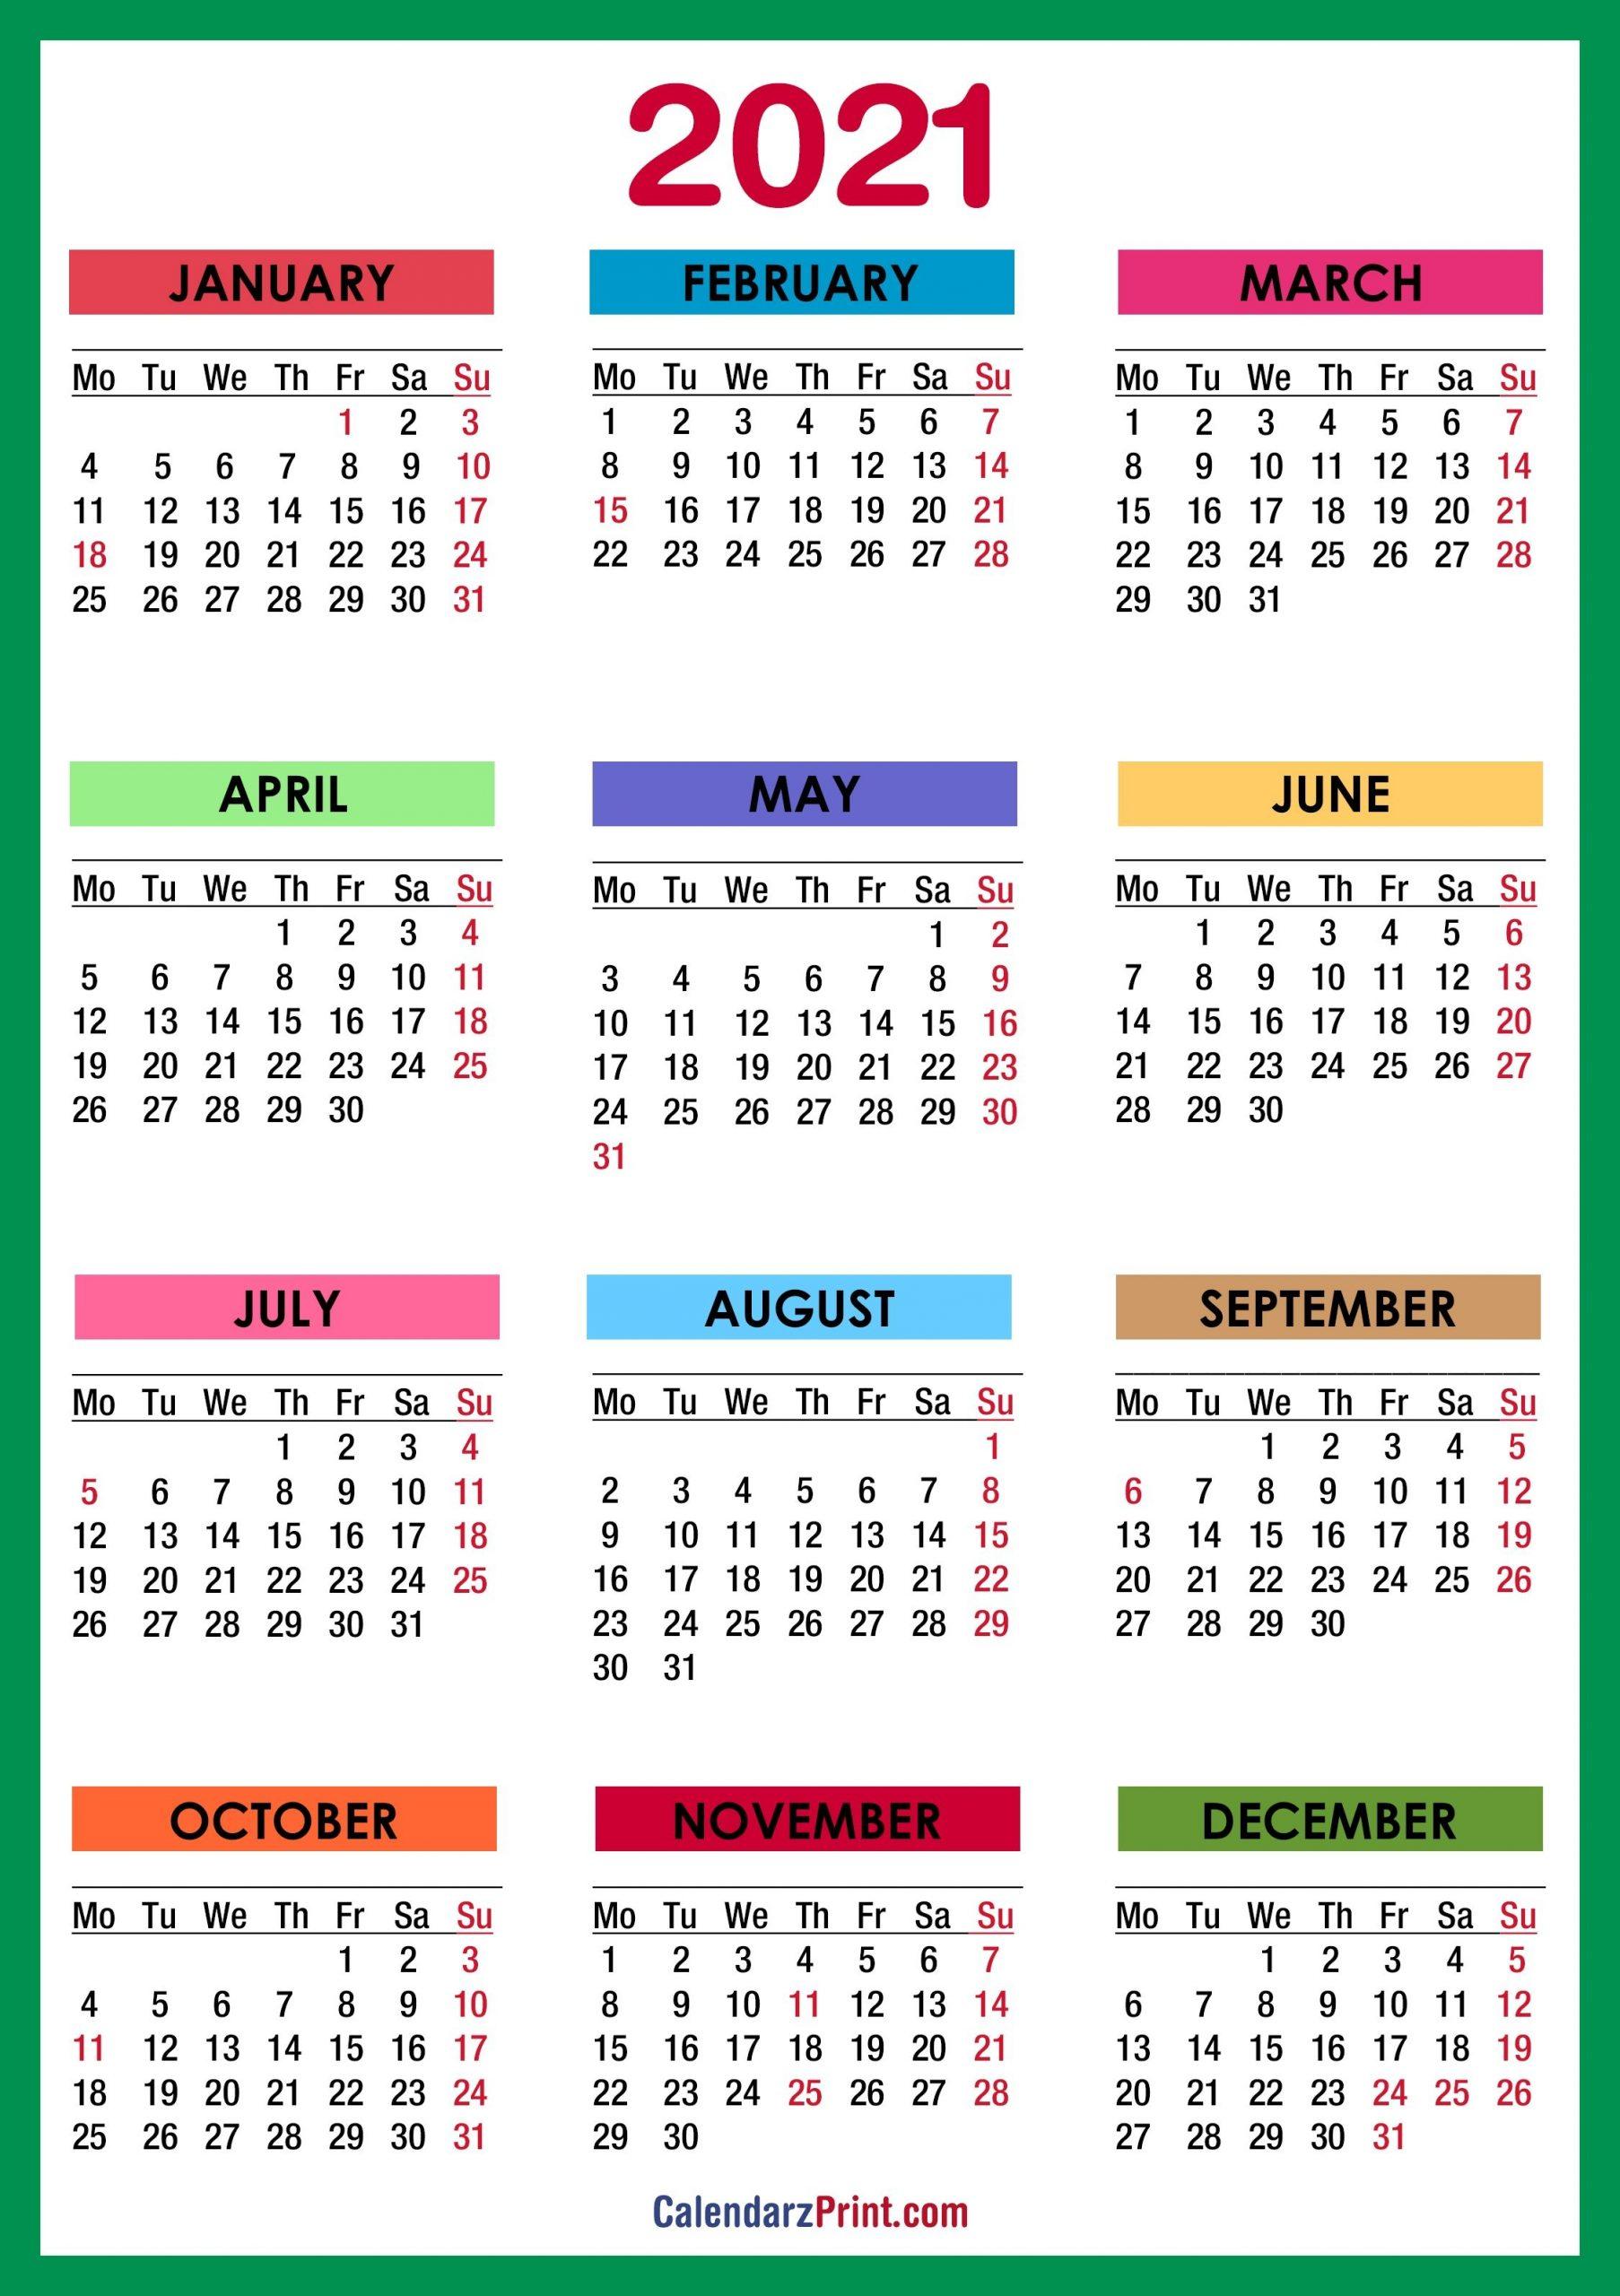 January 2021 Calendar Wallpaper Wallpaper Download 2021